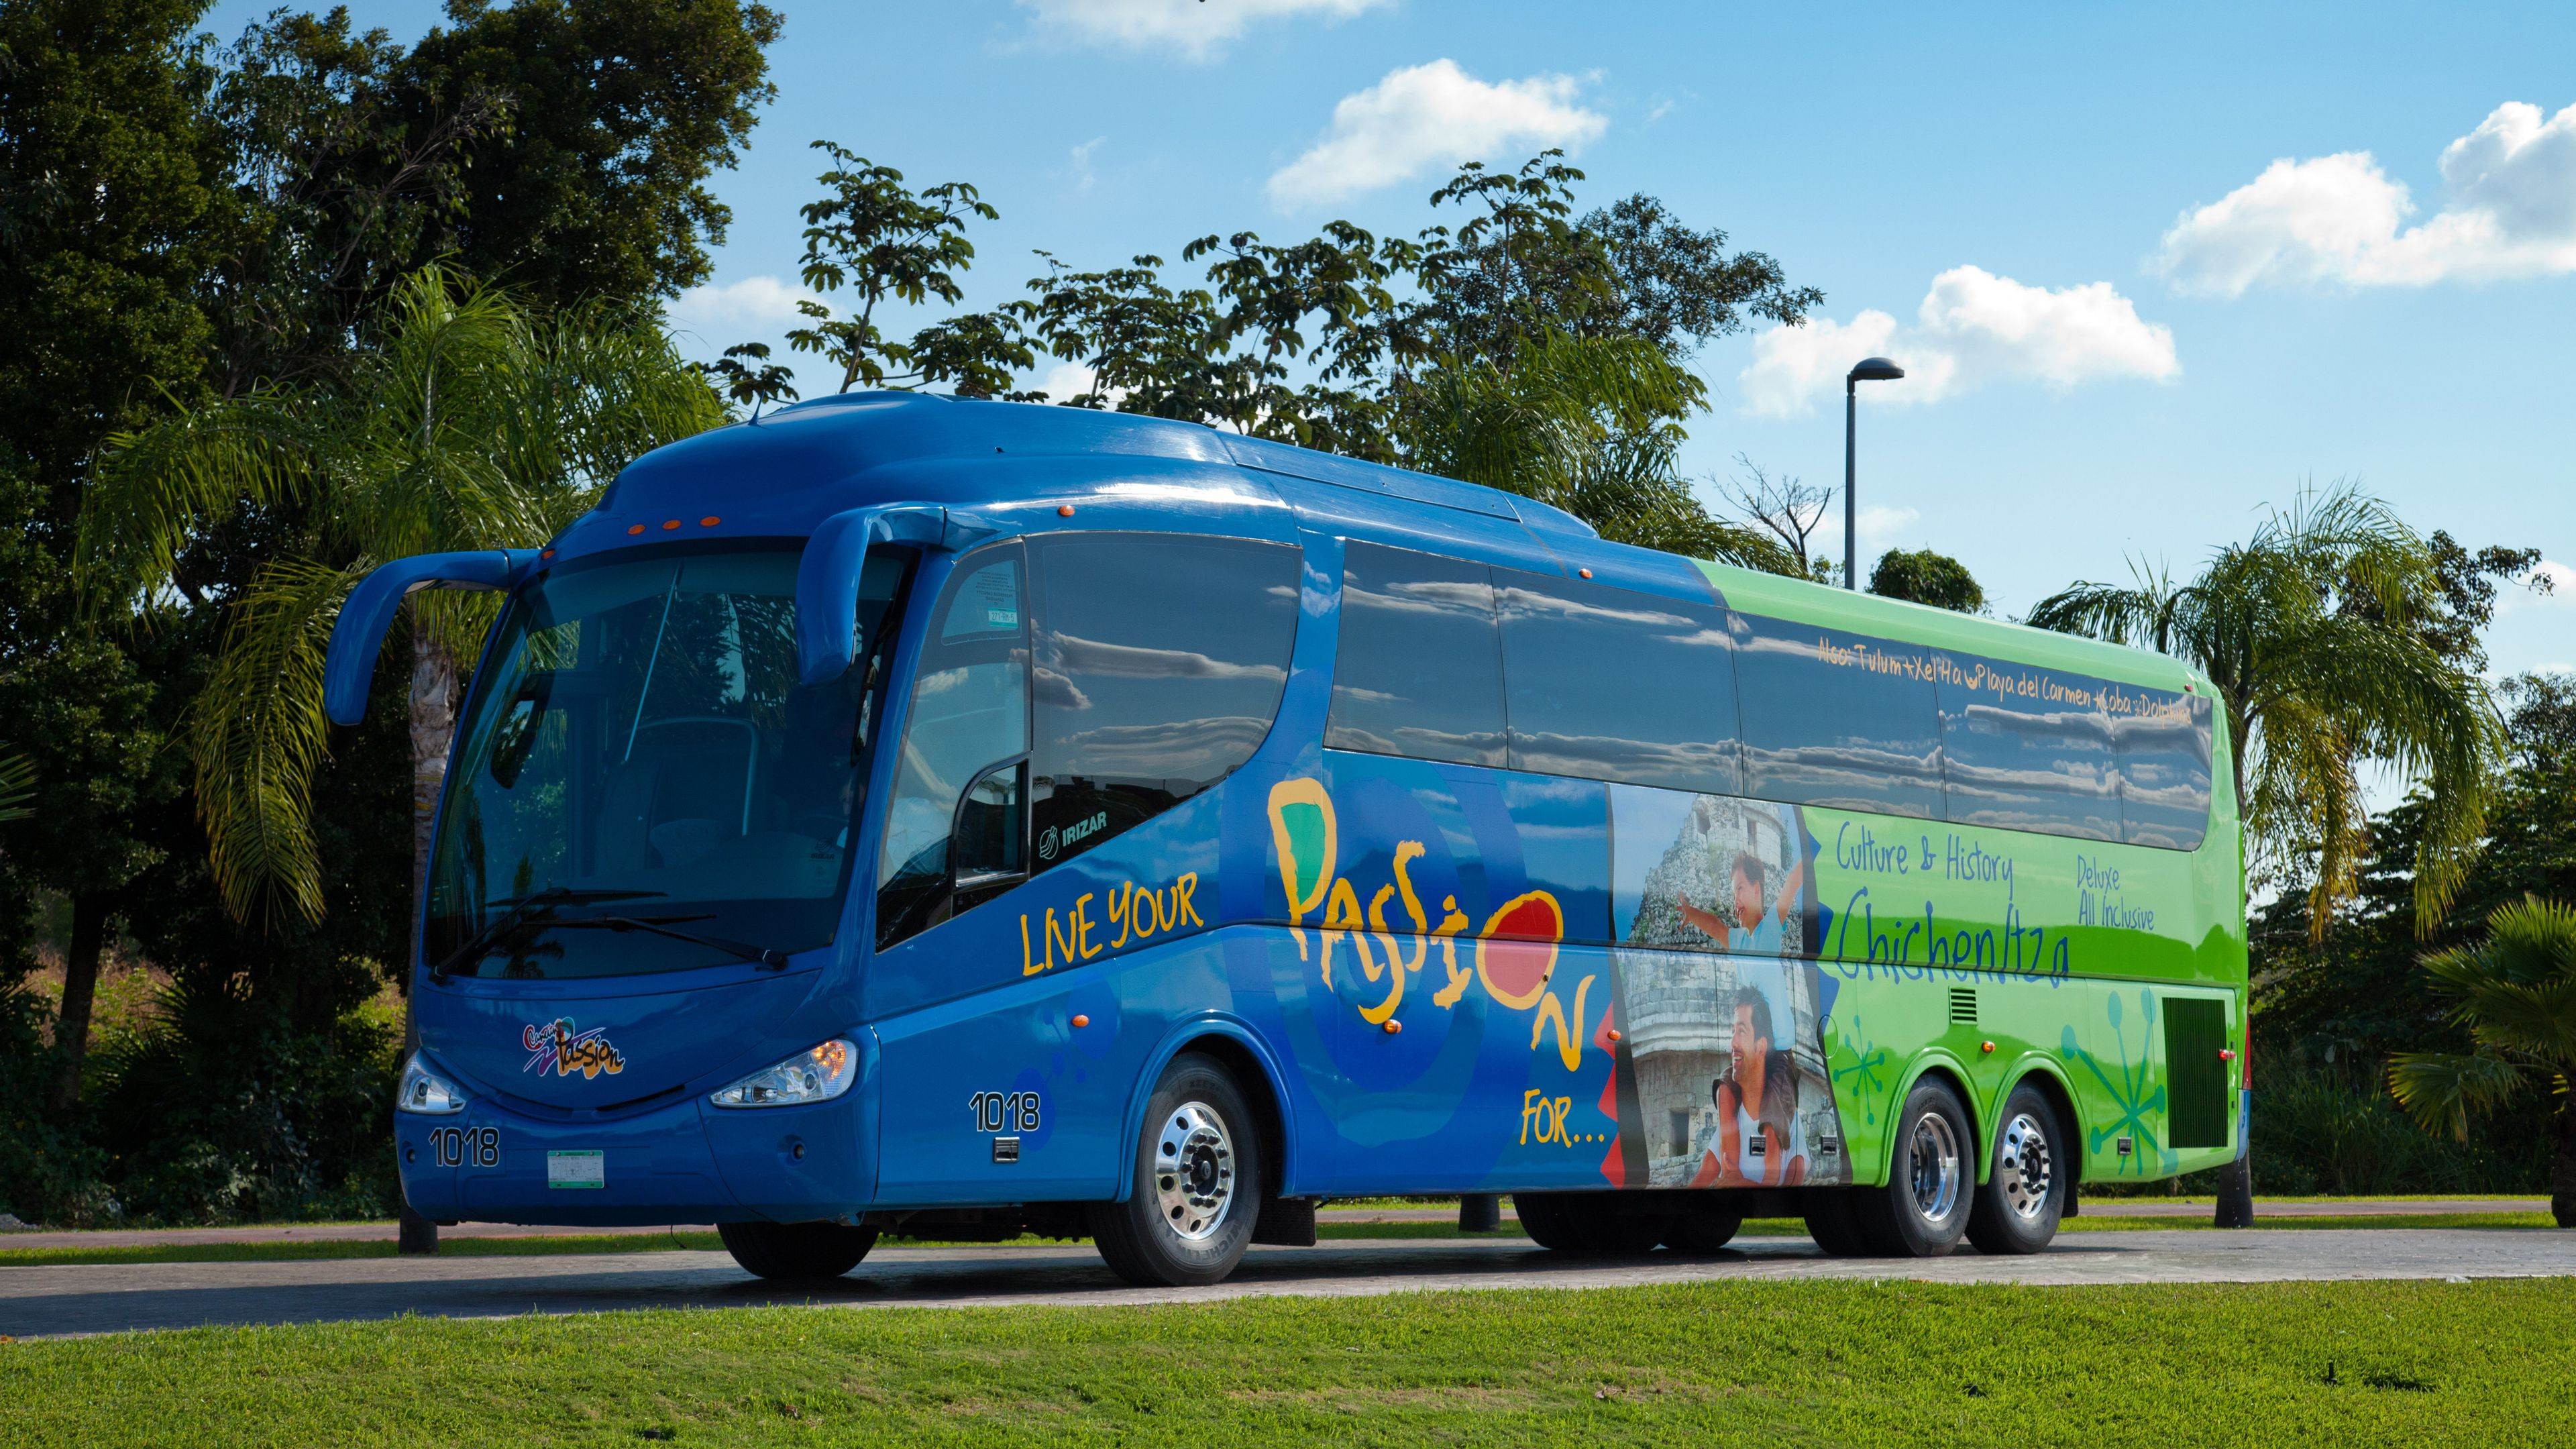 A tour bus in Mexico